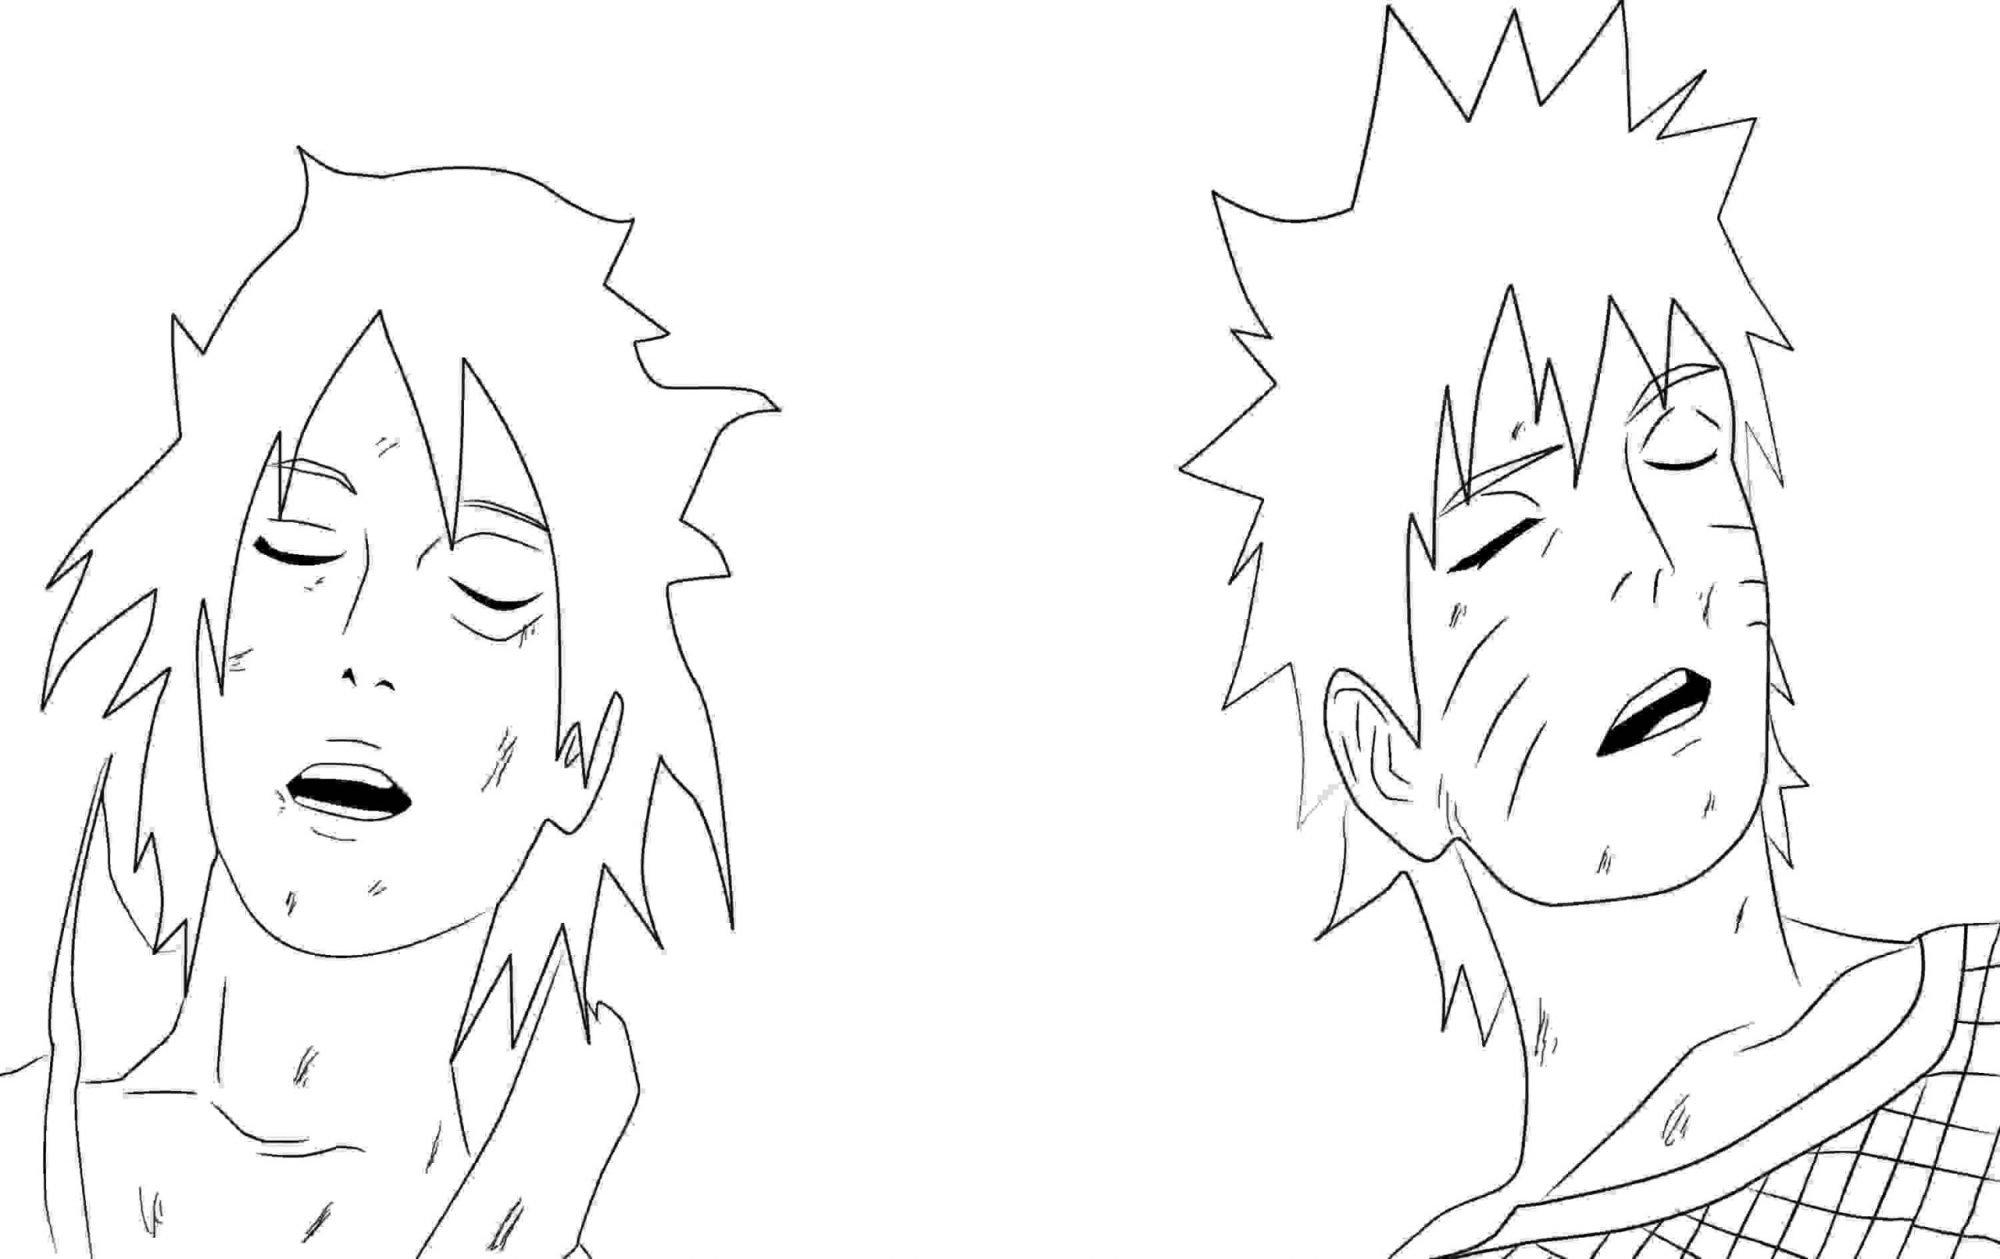 Uzumaki Naruto and Uchiha Sasuke after the fight Coloring Page